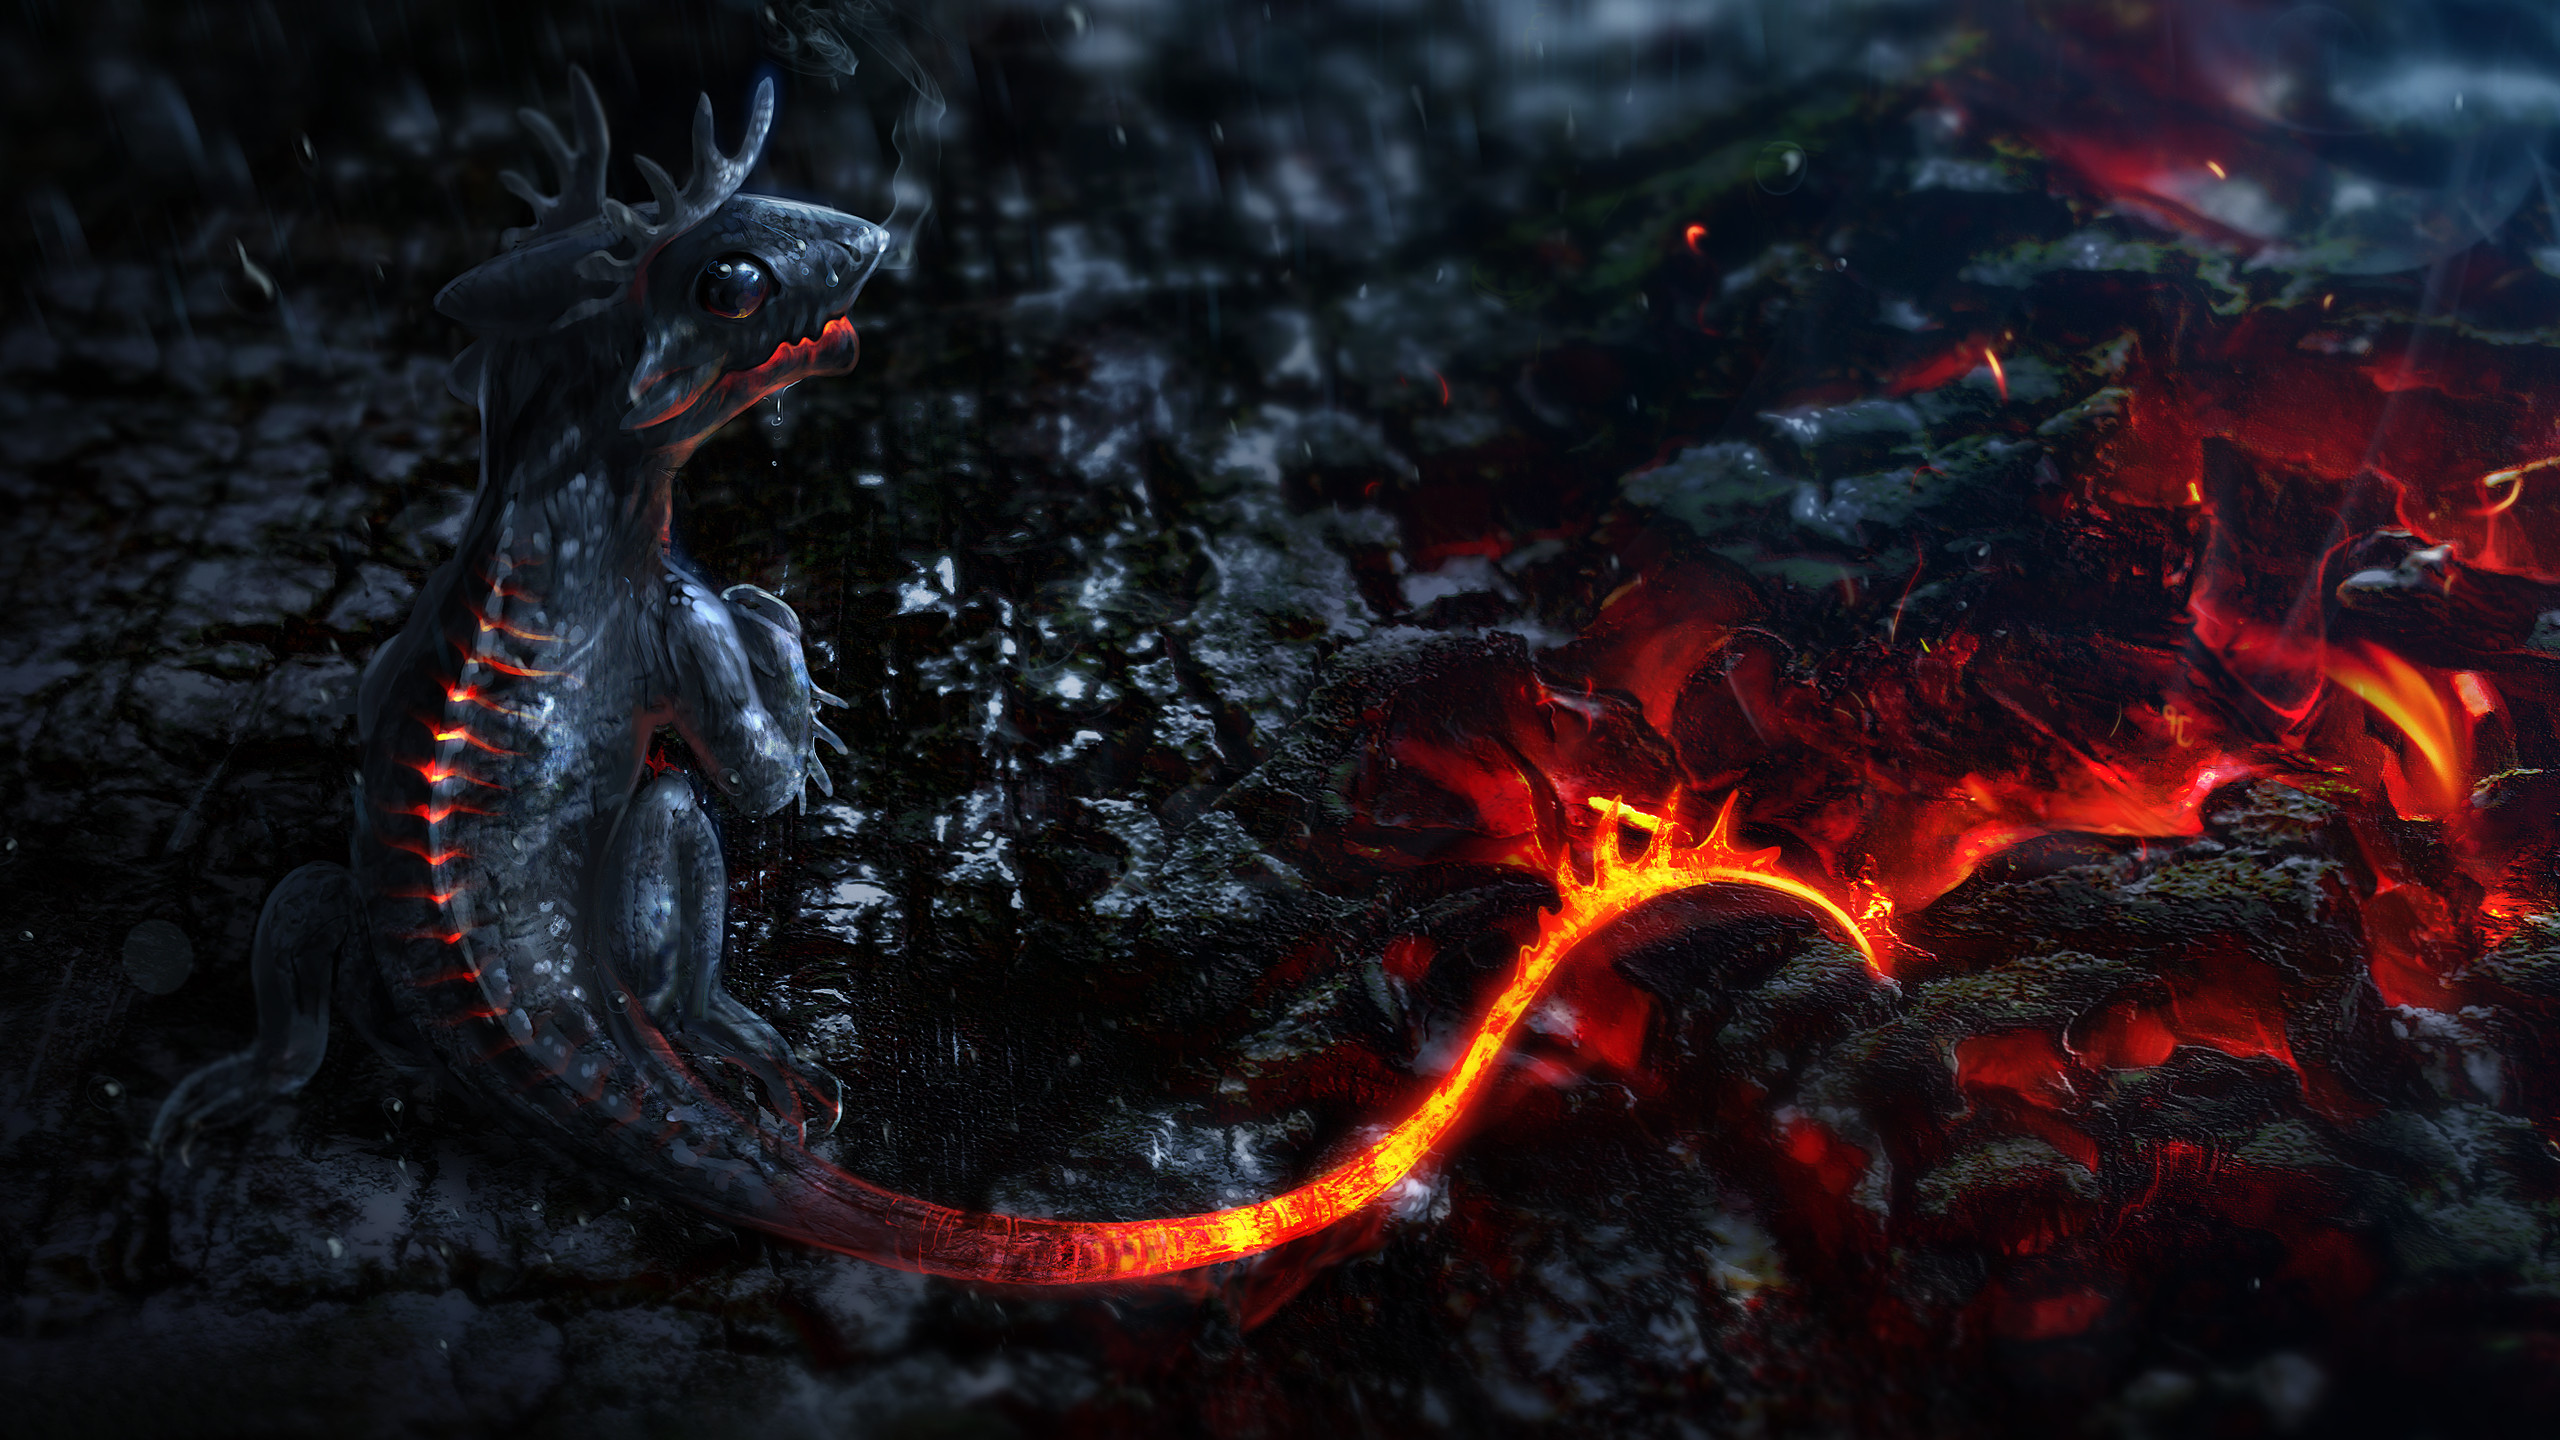 Dragon Wallpaper HD 1080p (76+ Images